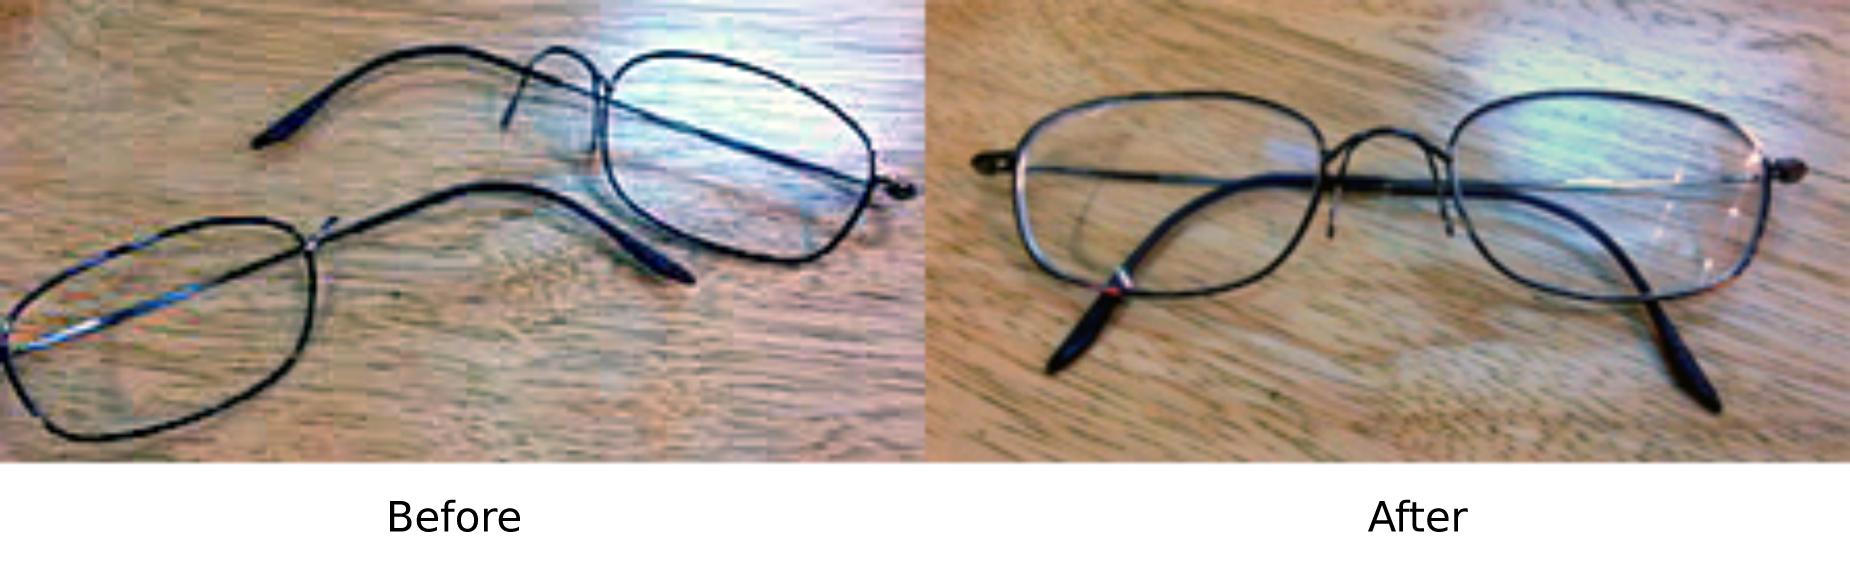 Eyeglass Repair